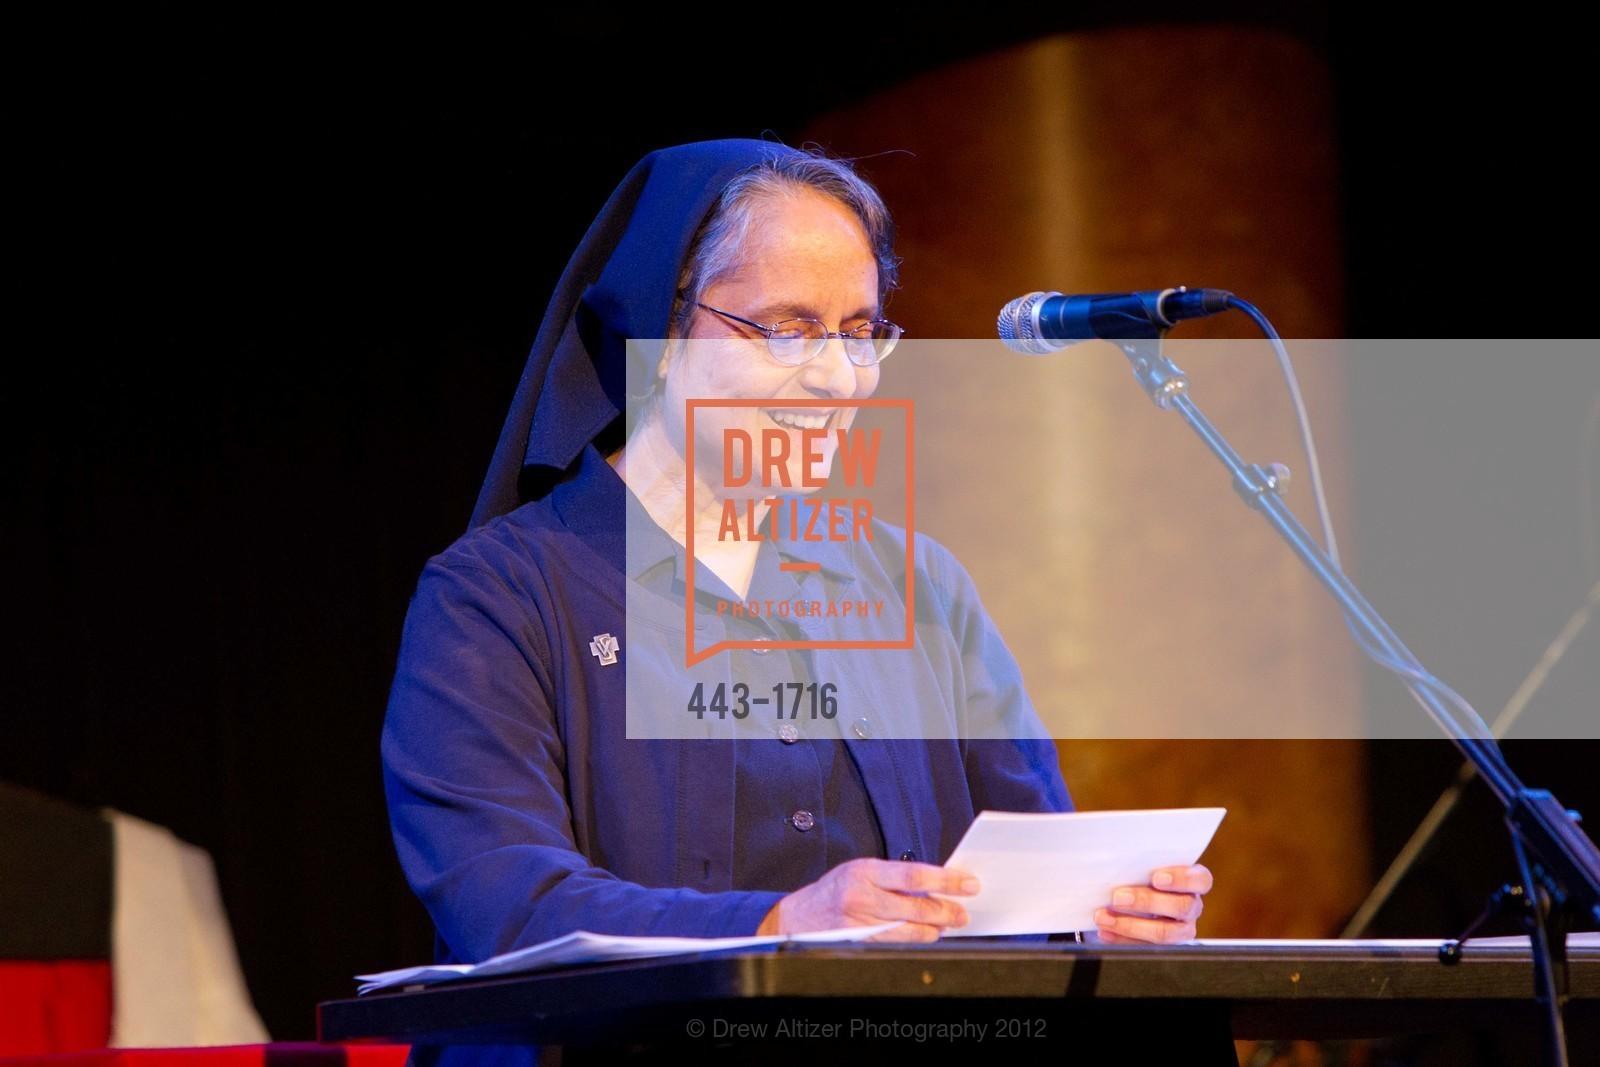 Sister Estela Morales, Photo #443-1716